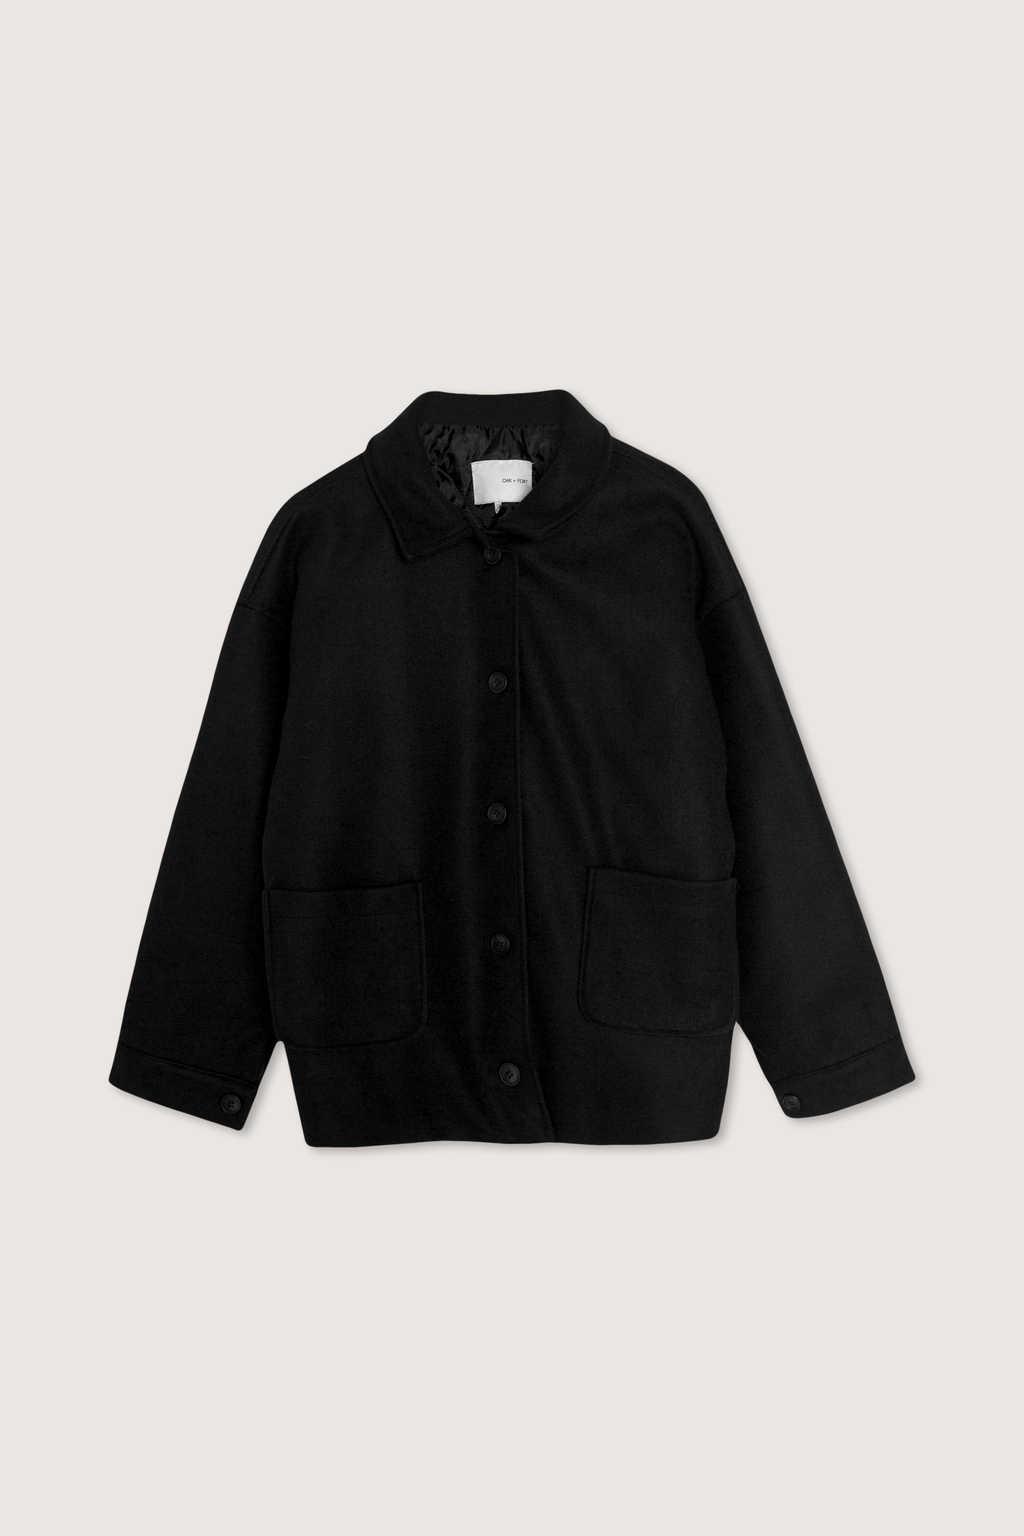 Jacket H204 Black 9